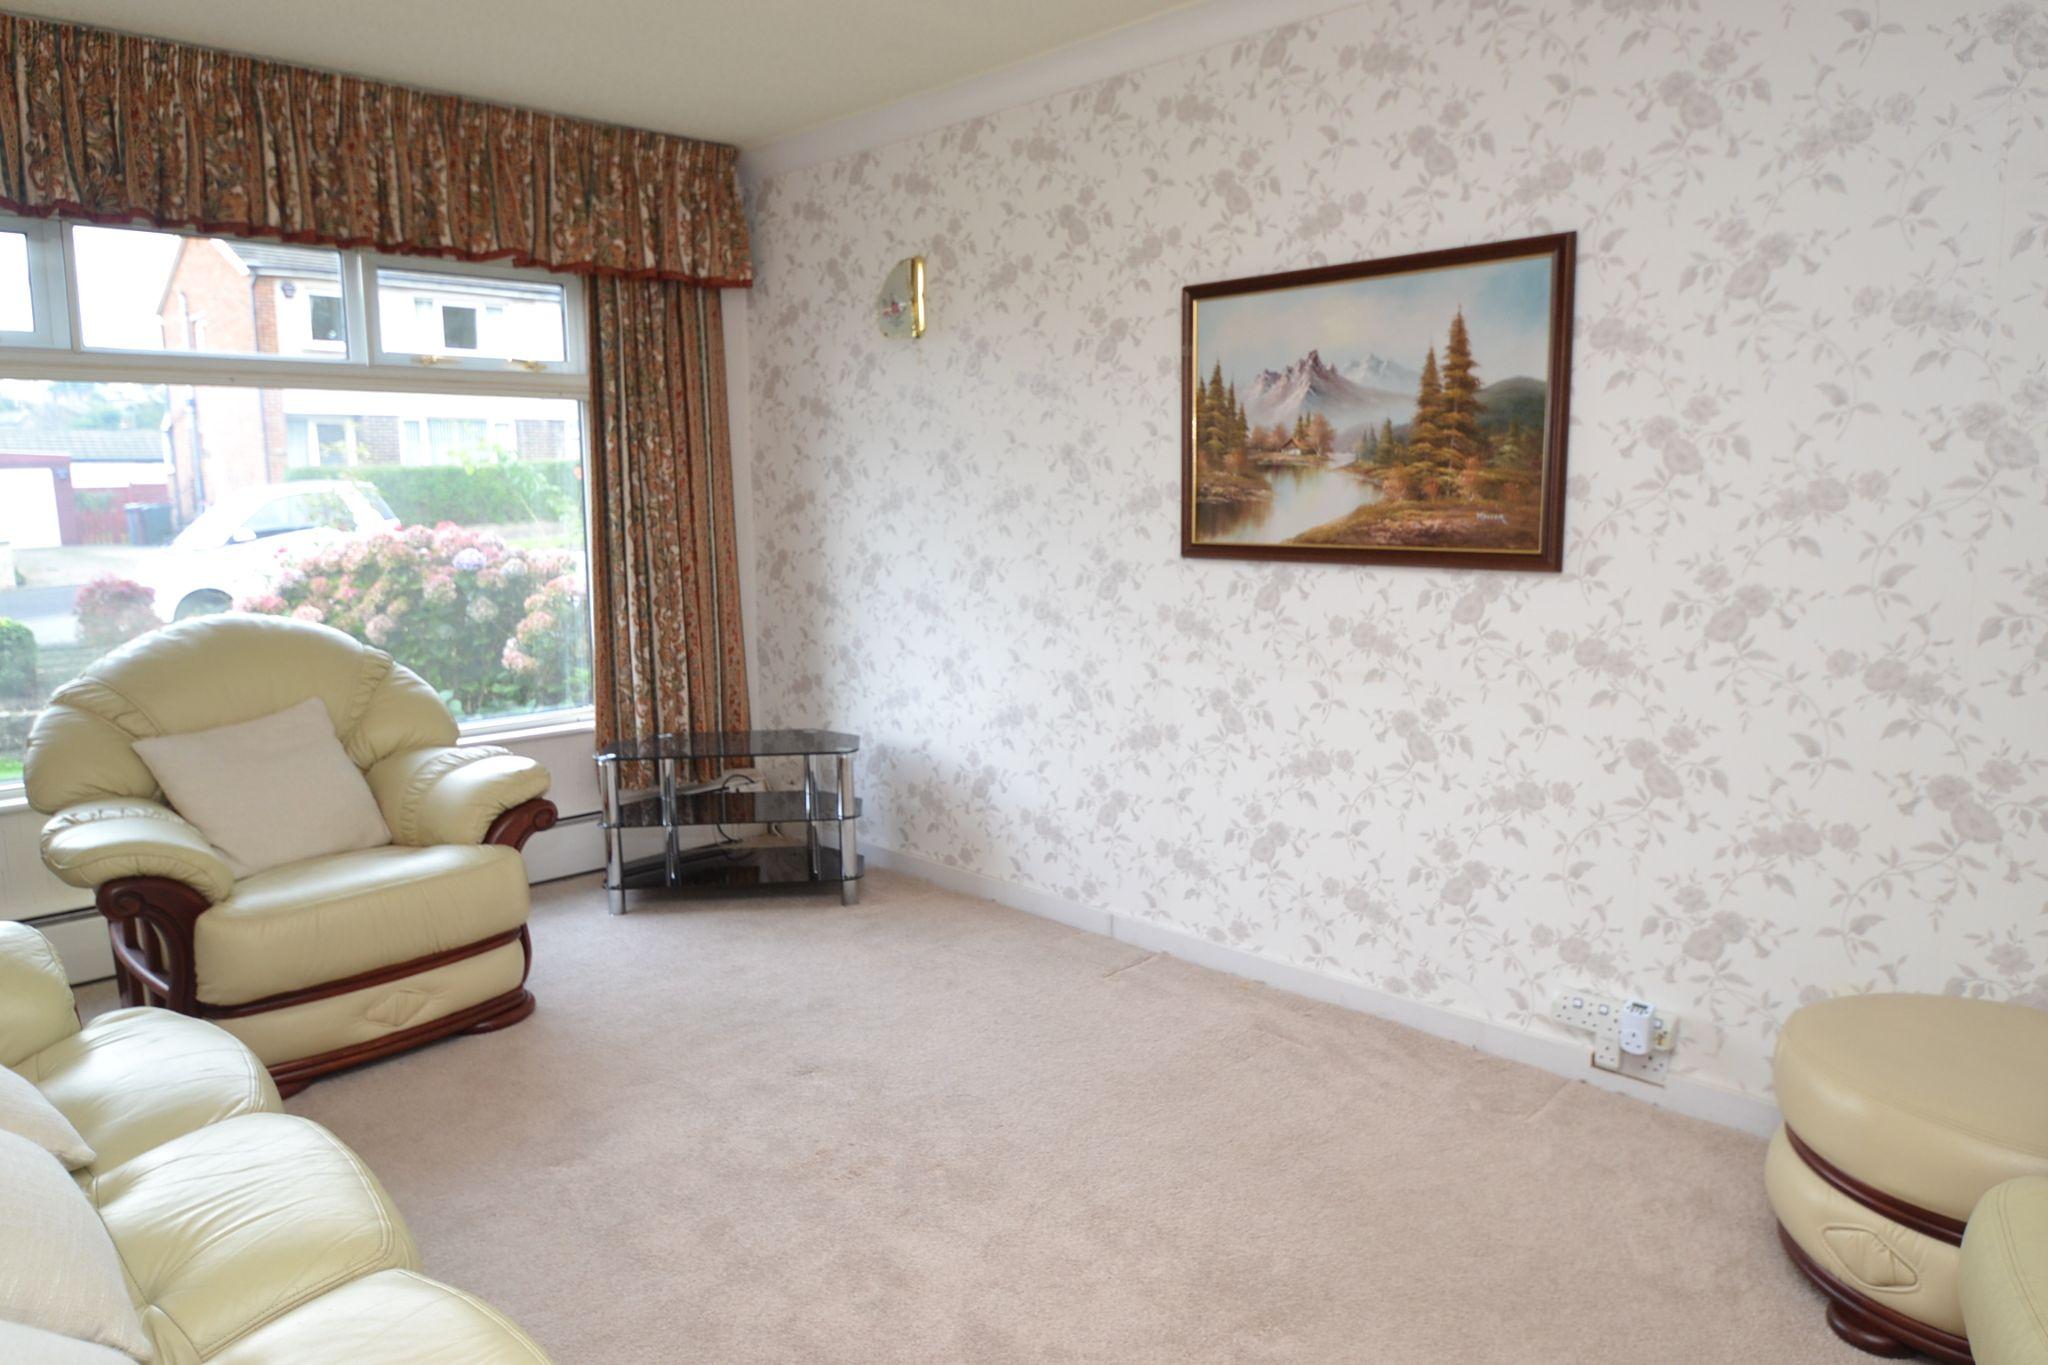 3 Bedroom Semi-detached Dormer House For Sale - Photograph 2